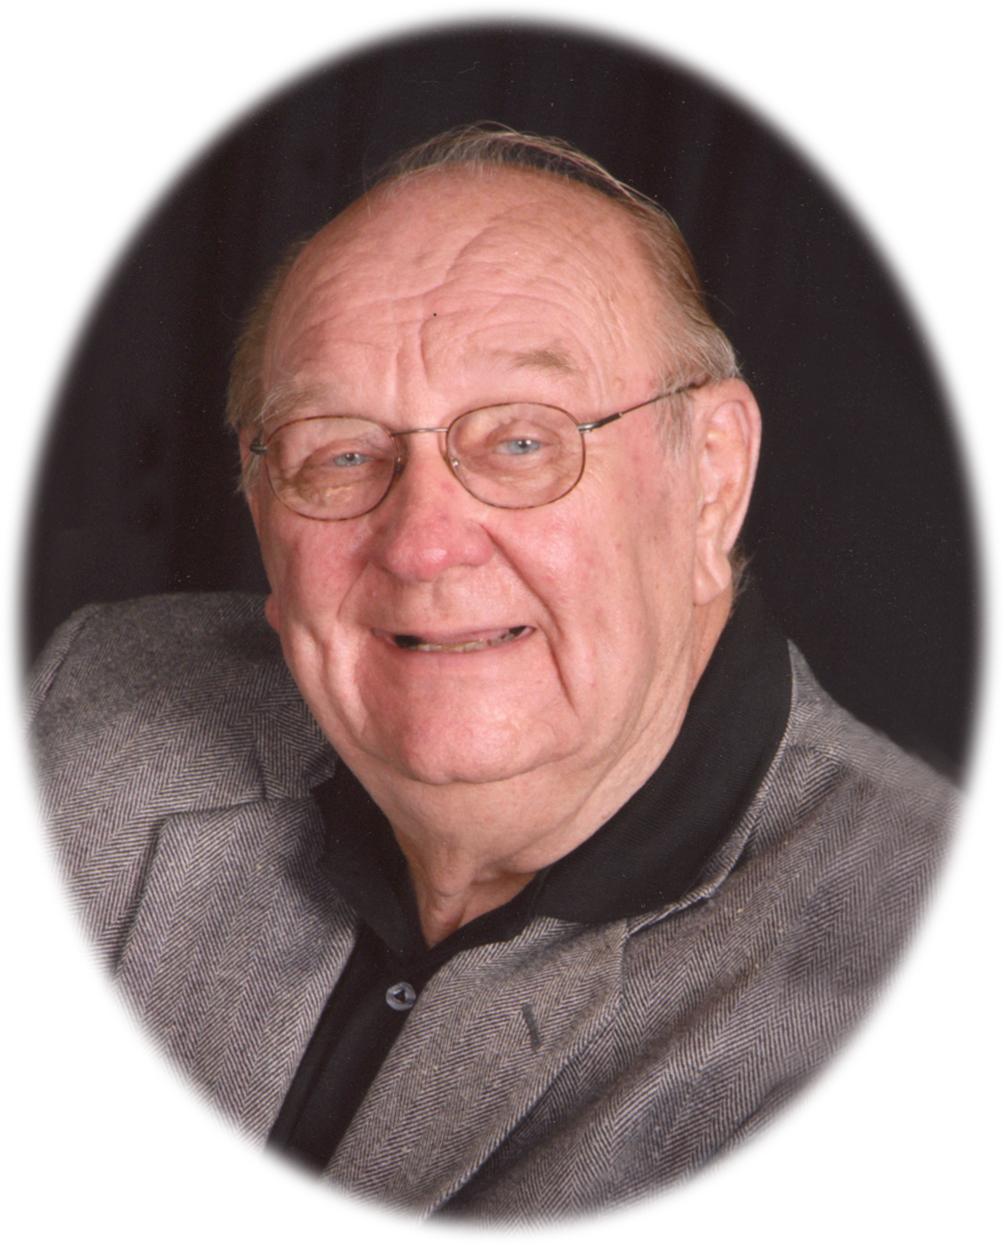 Daniel E. McCarthy